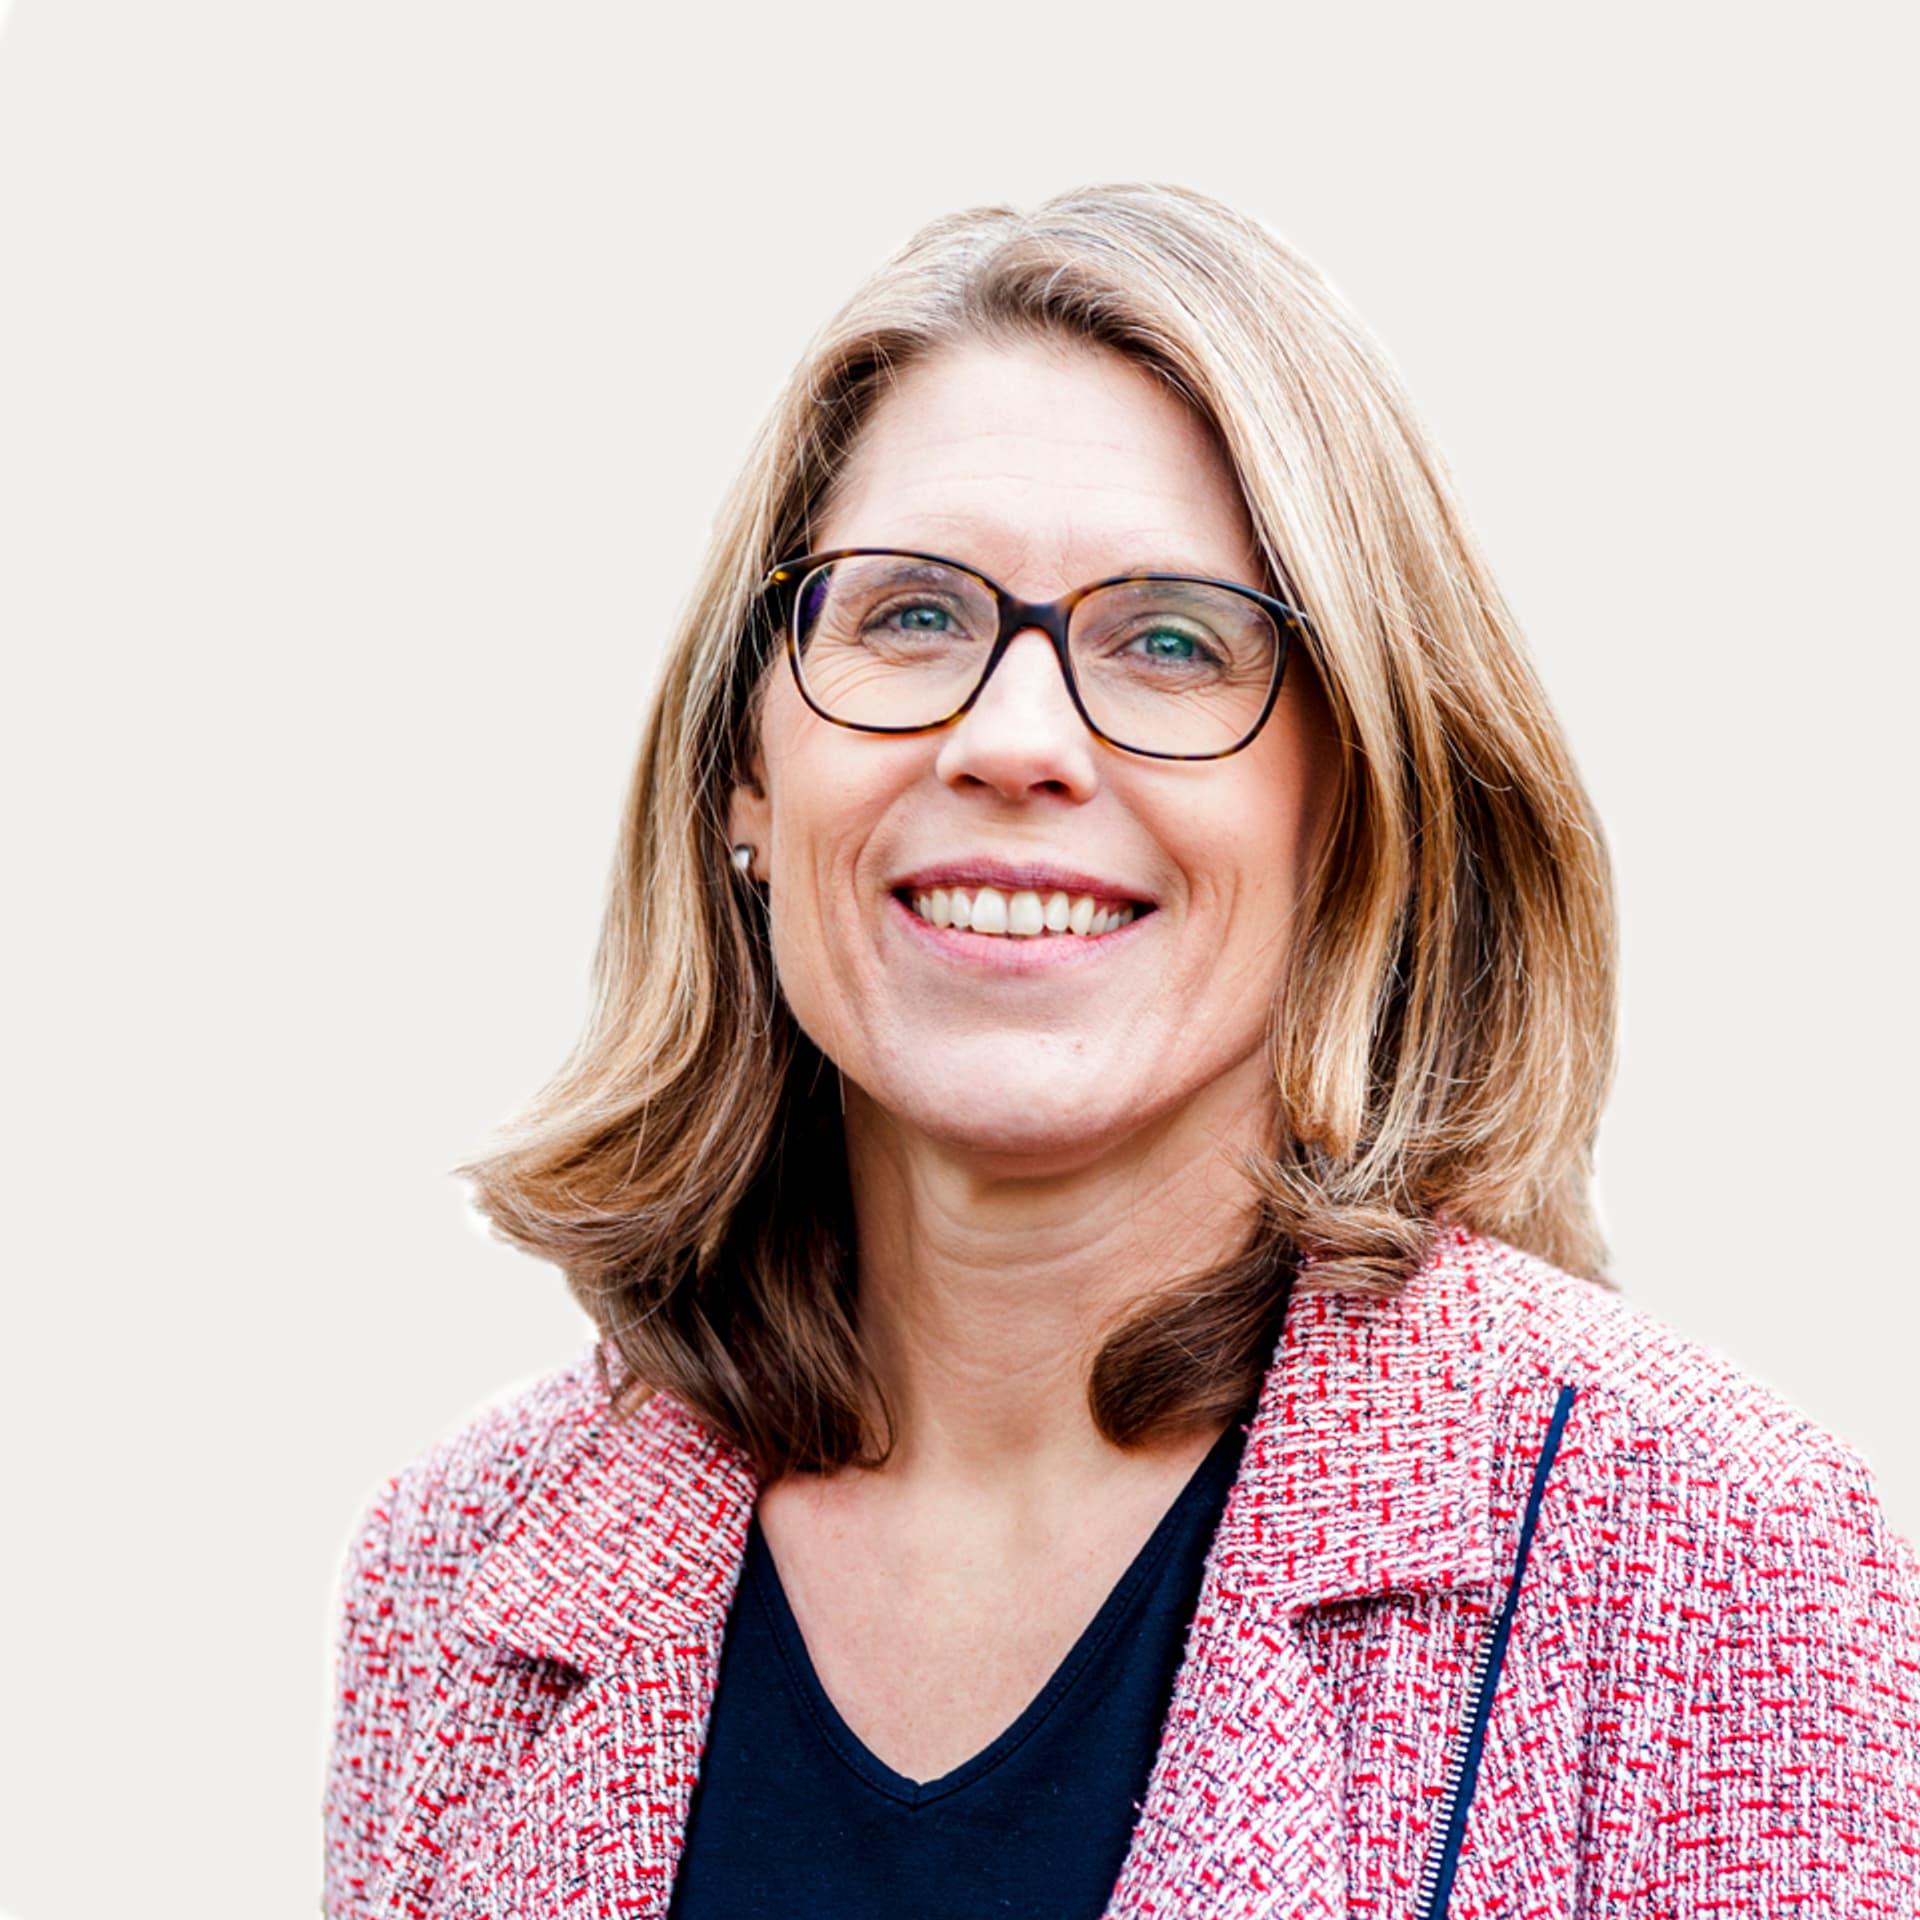 Nicole Pollakowsky